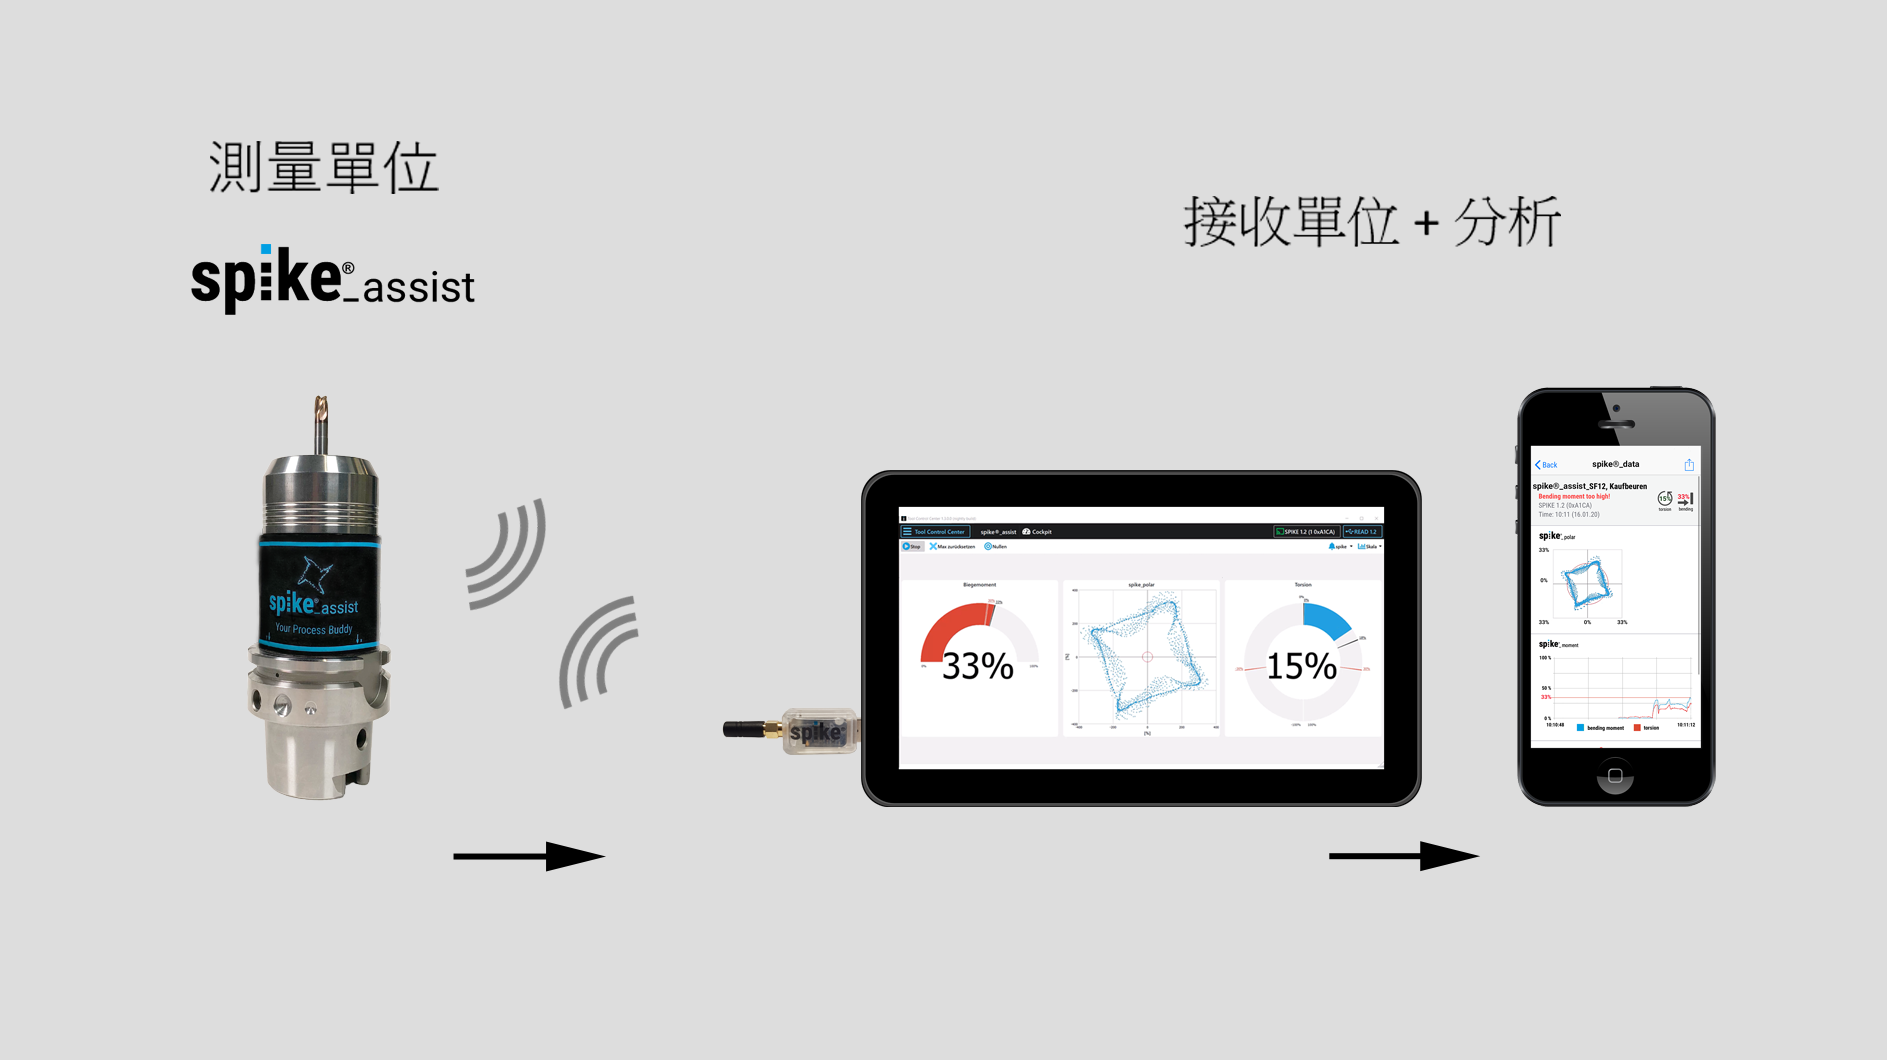 spike_assist_trad_chinesisch